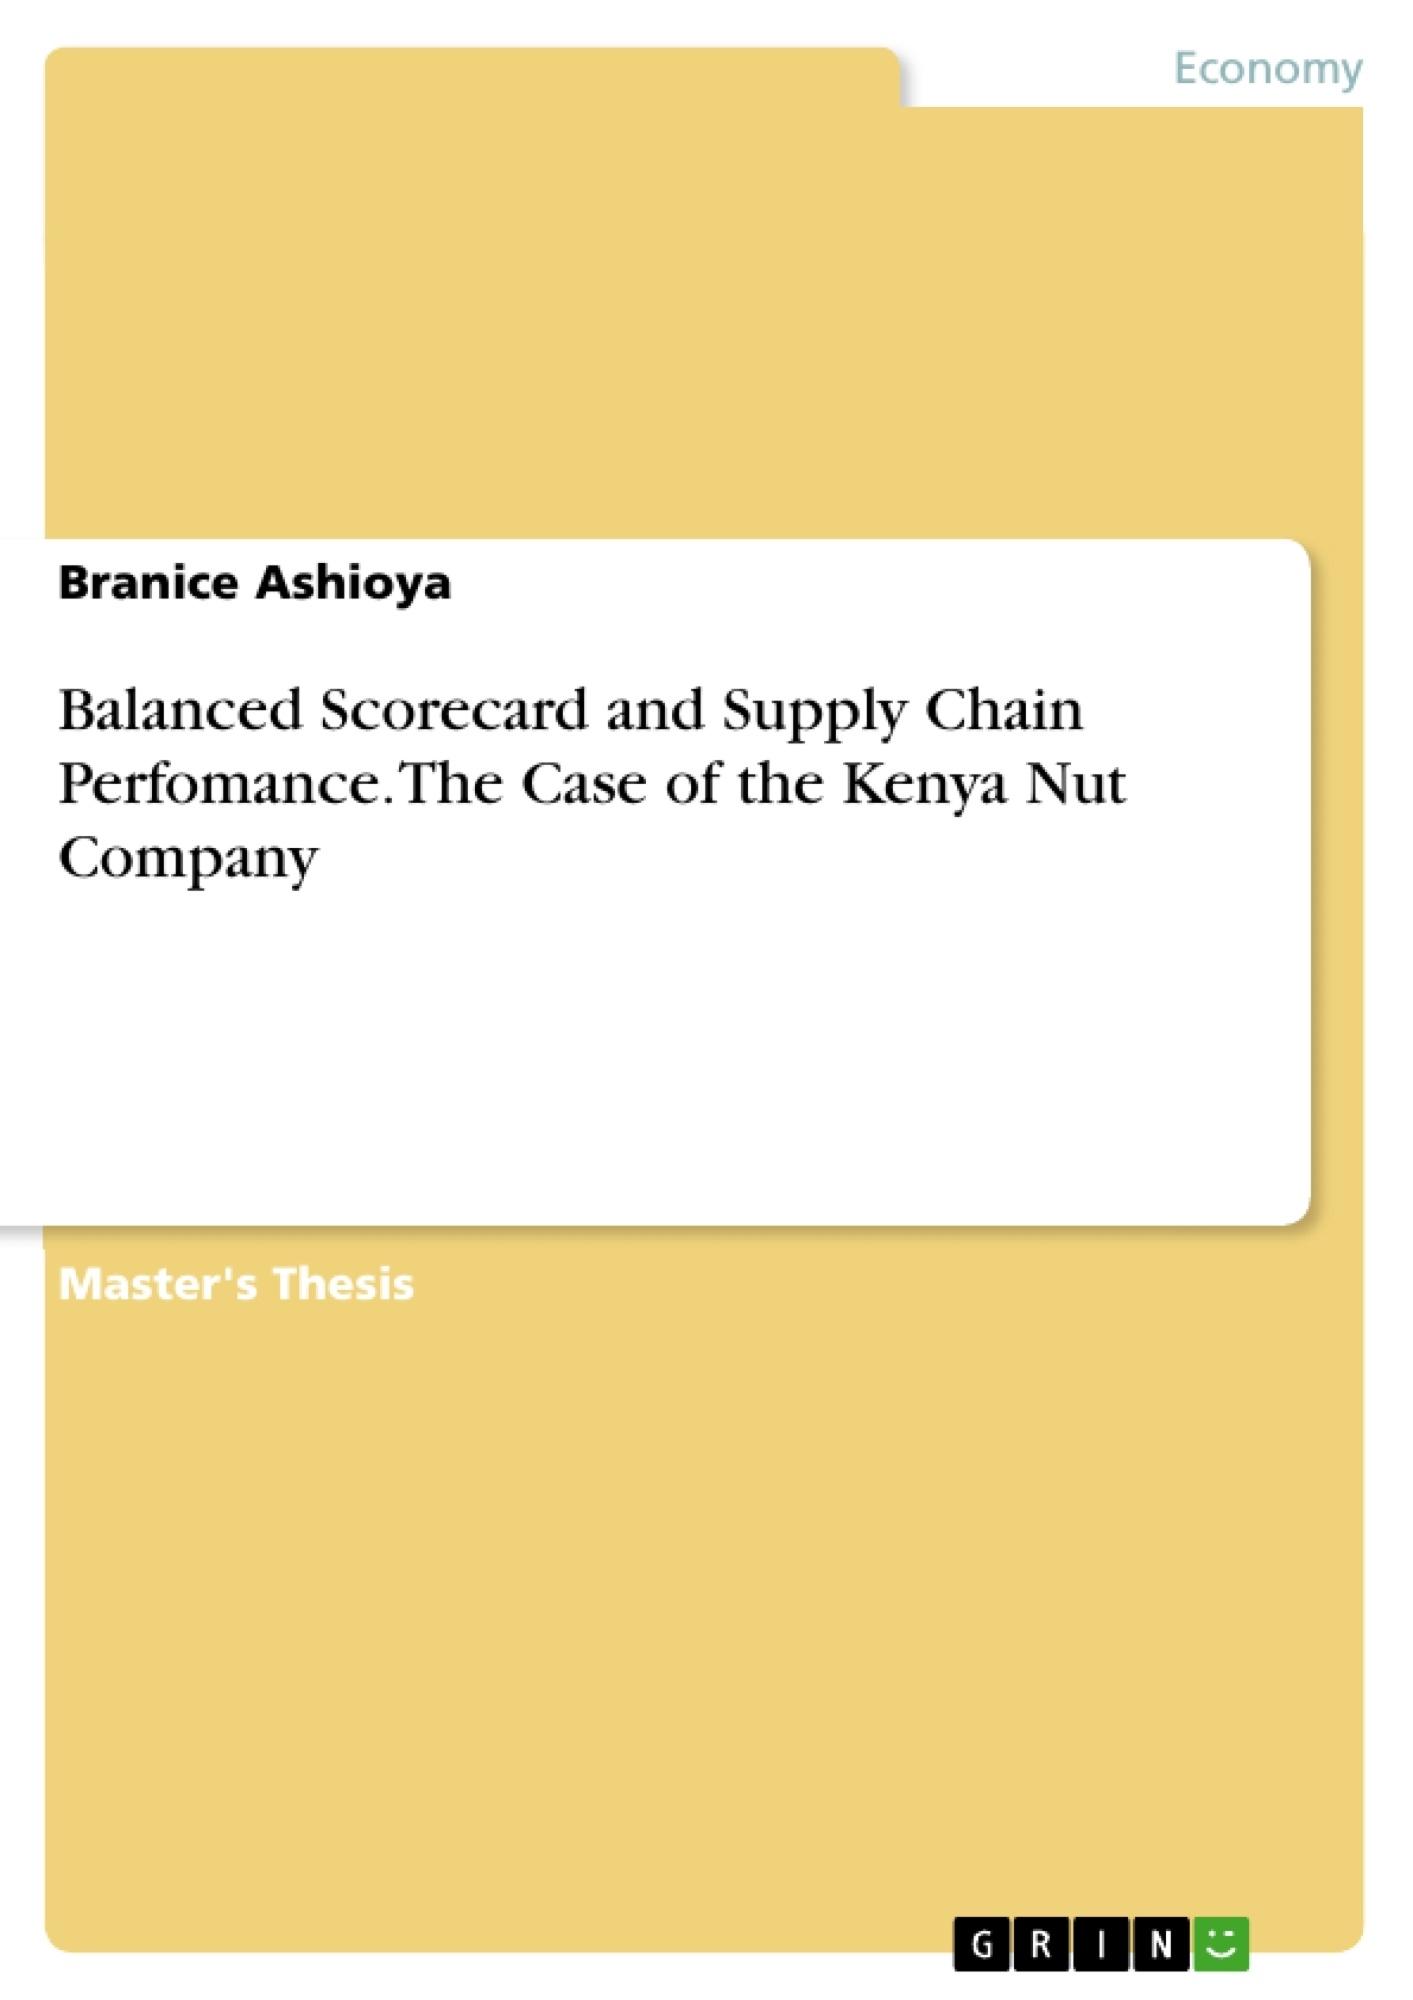 Balanced scorecard phd thesis